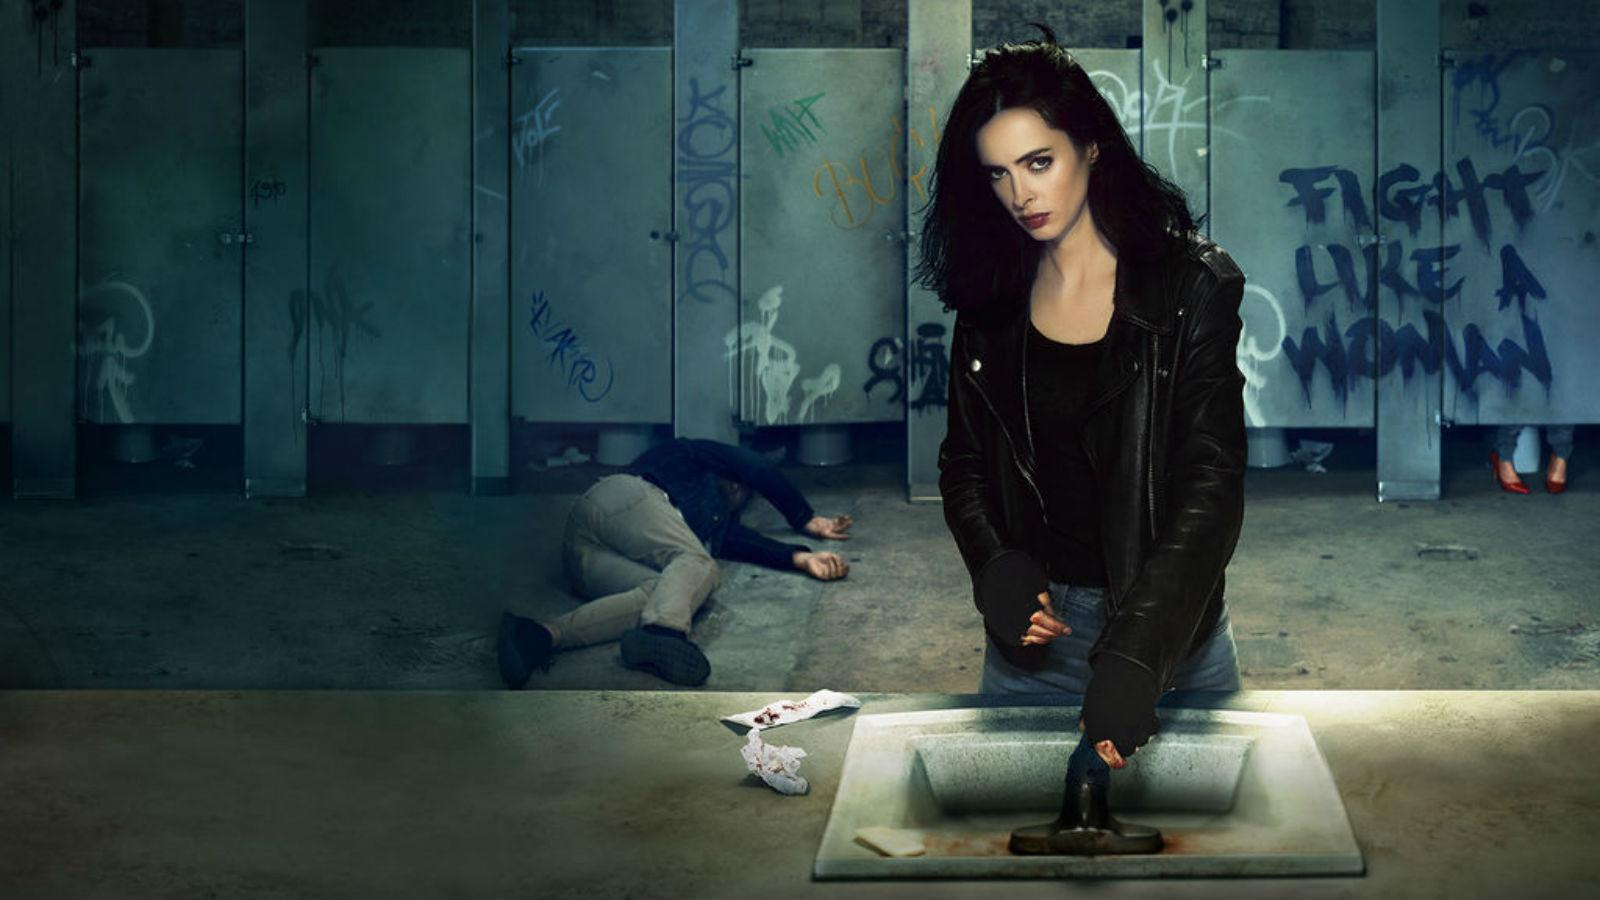 Jessica Jones Tendrá Tercera Temporada Sin Fecha Definida Aún